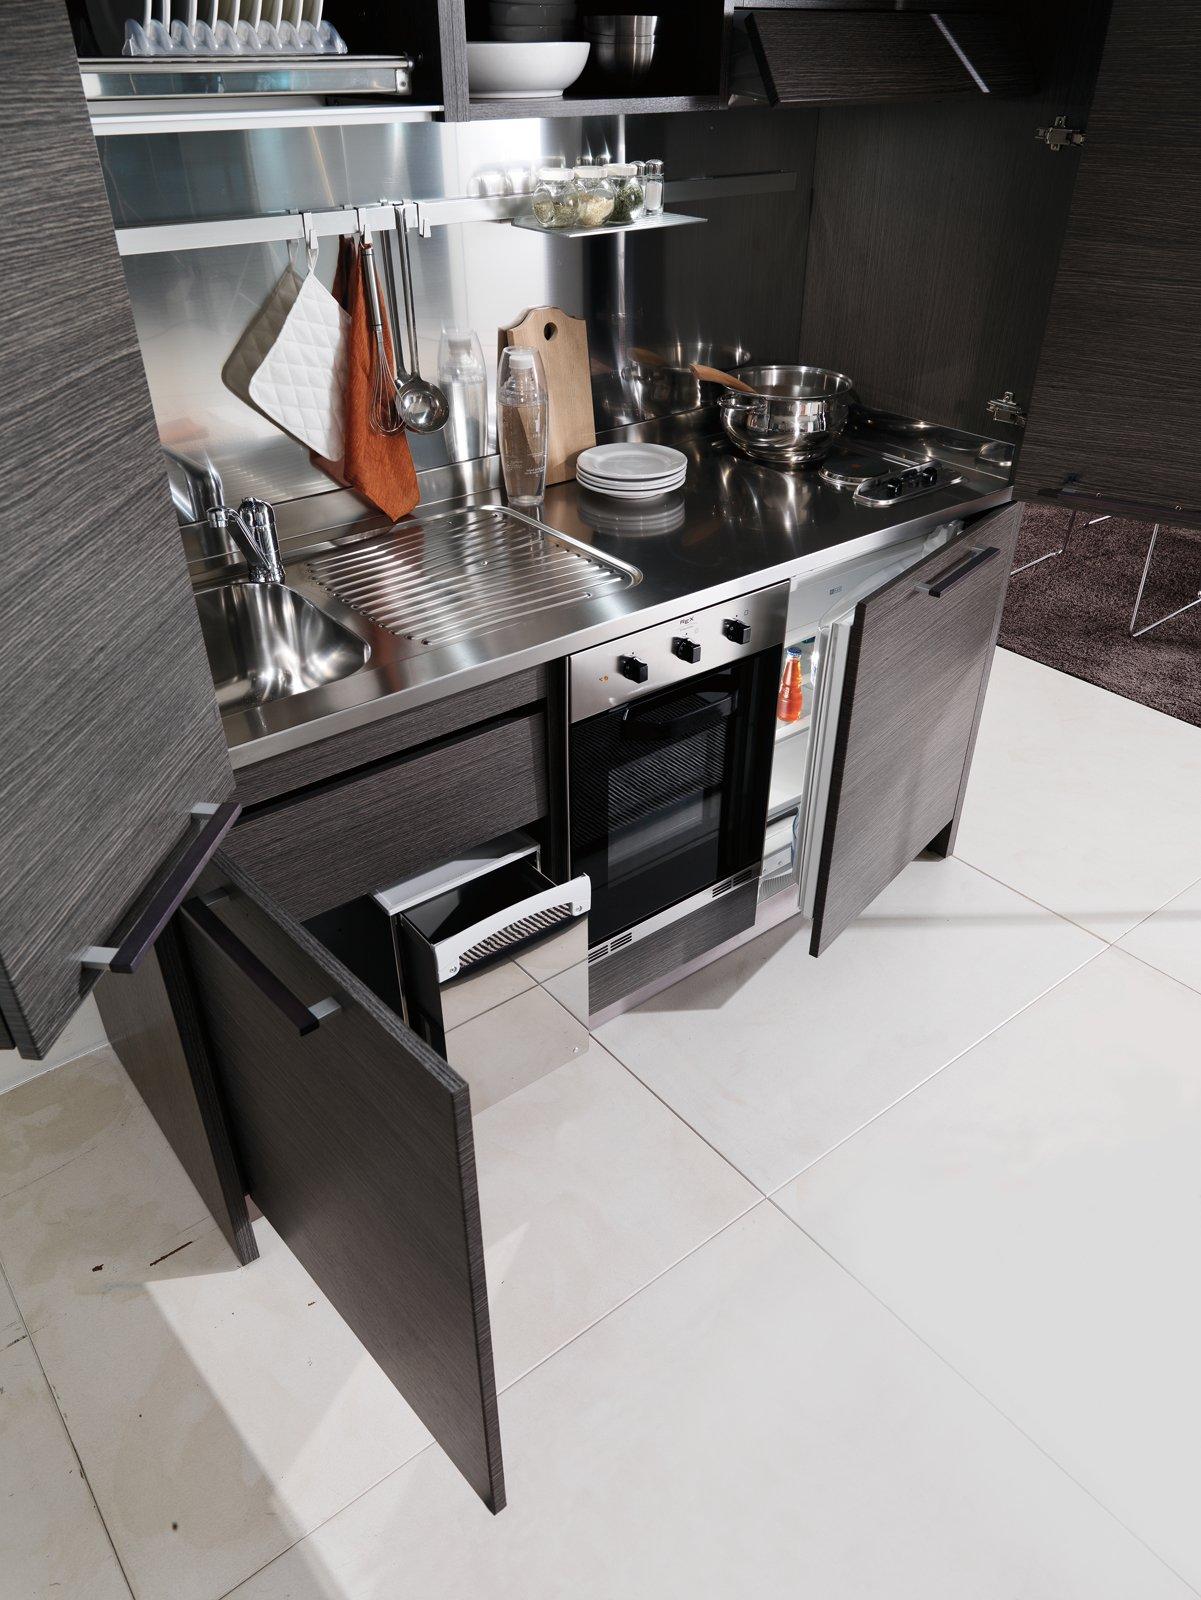 Cucine Piccole Anzi Mini. A Volte Nascoste Cose Di Casa #634D45 1201 1600 Cucine Piccole Senza Frigo